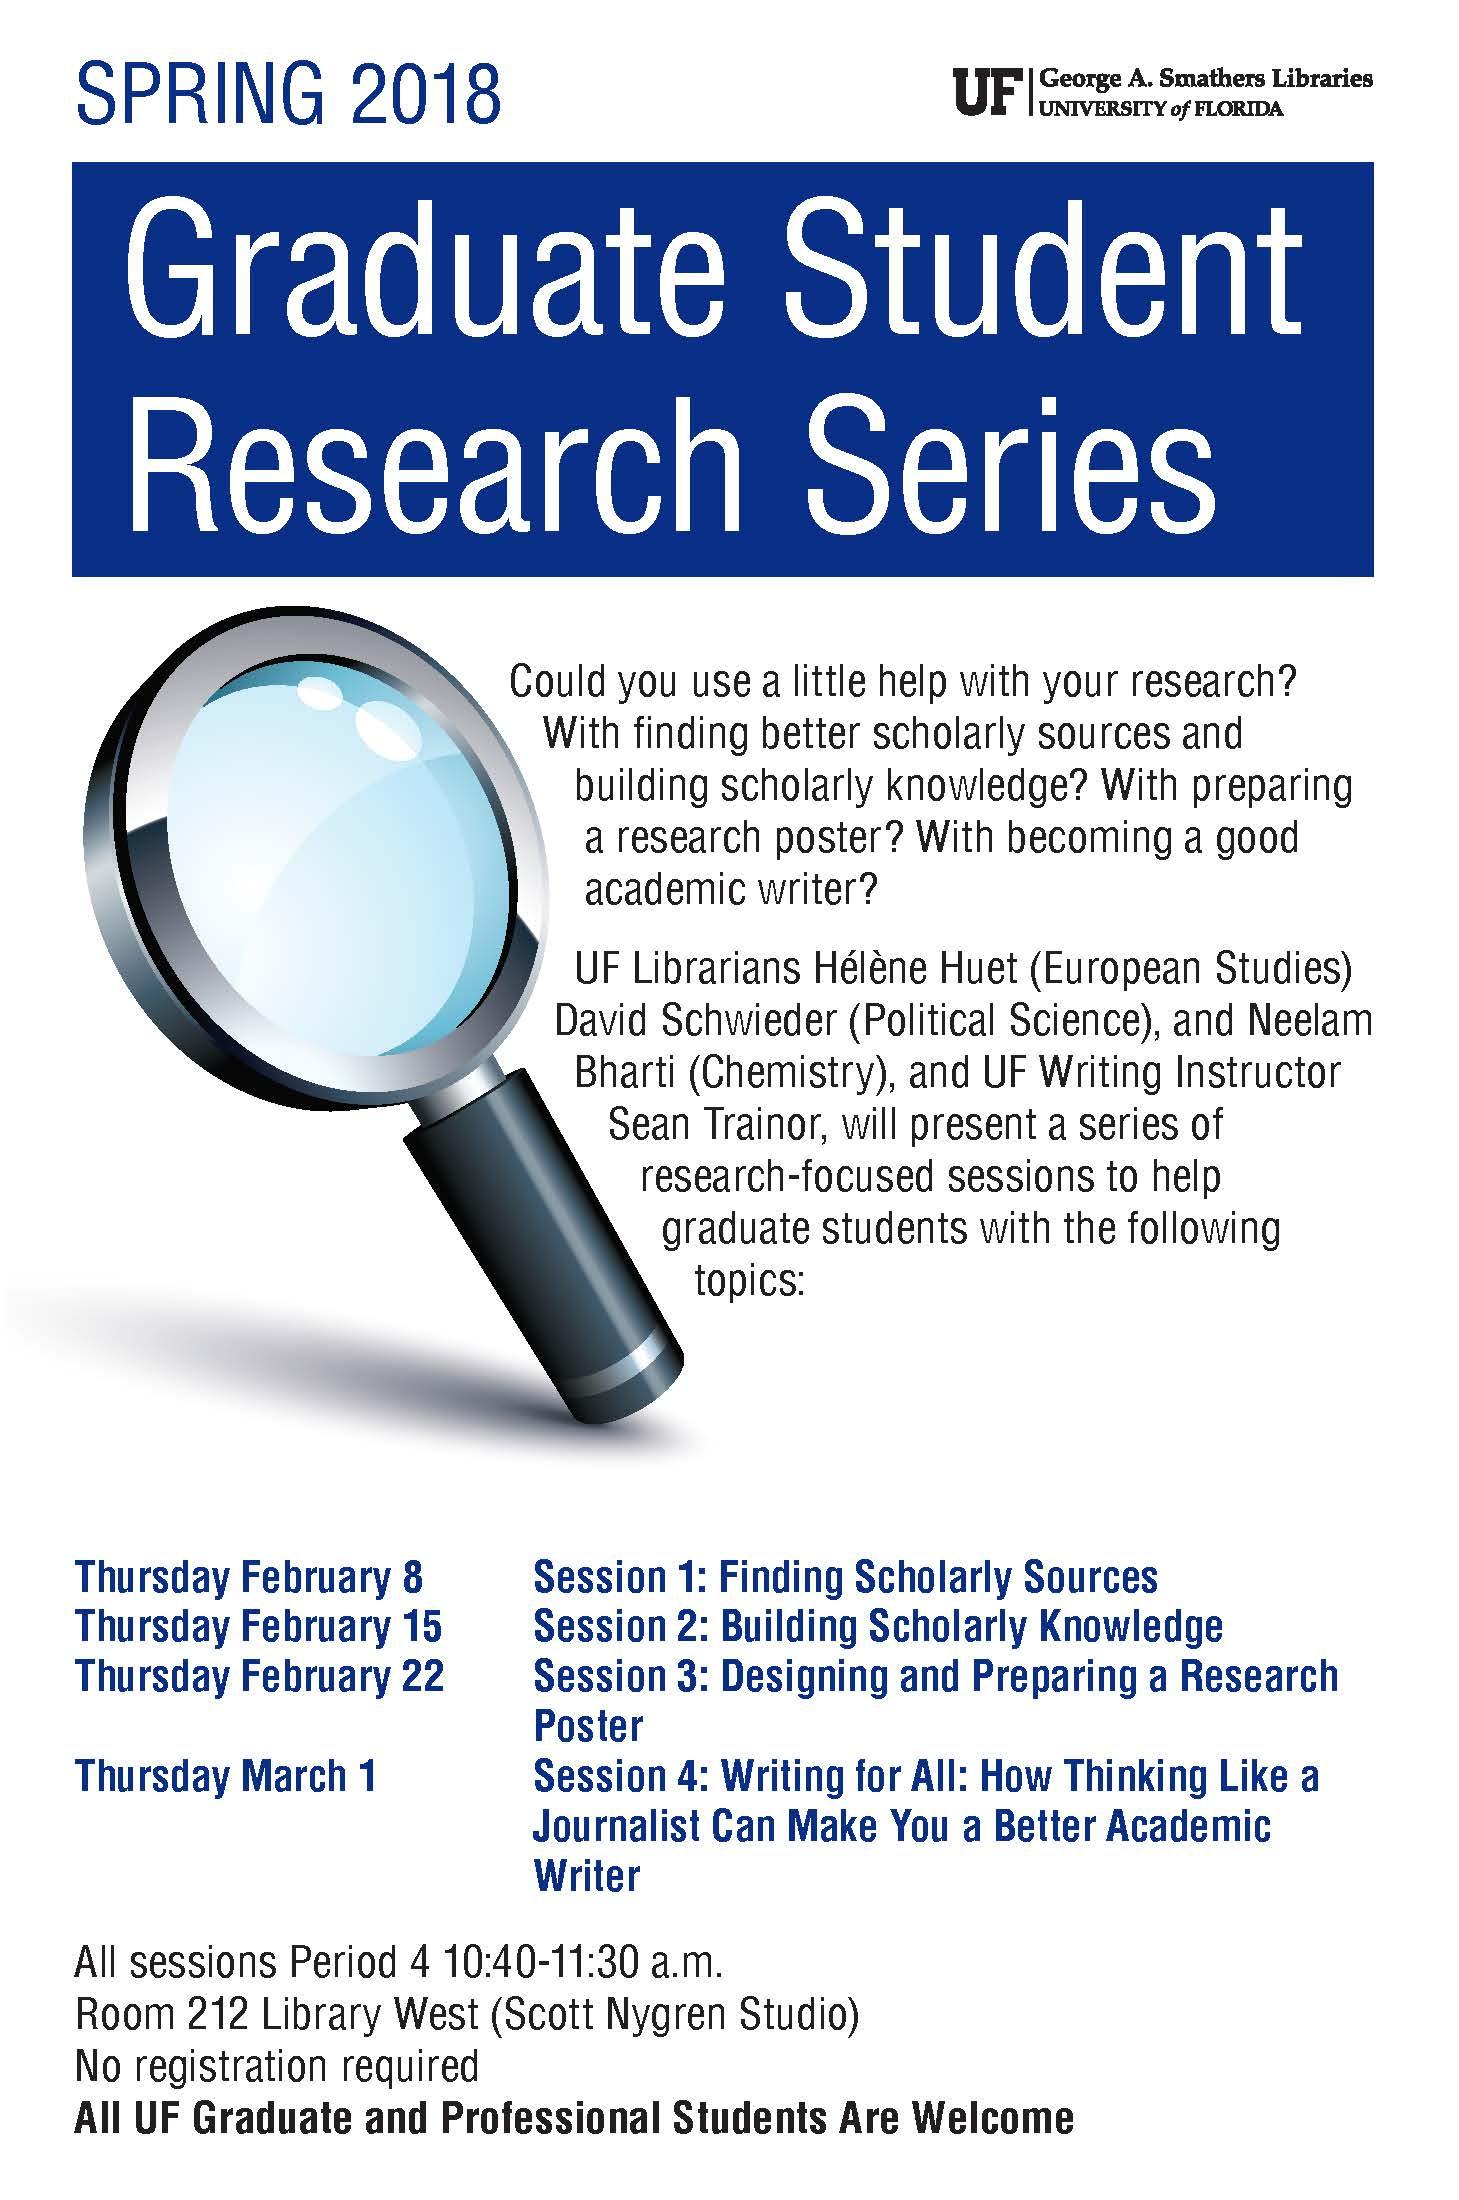 Grad-Student-Research-Series8x11